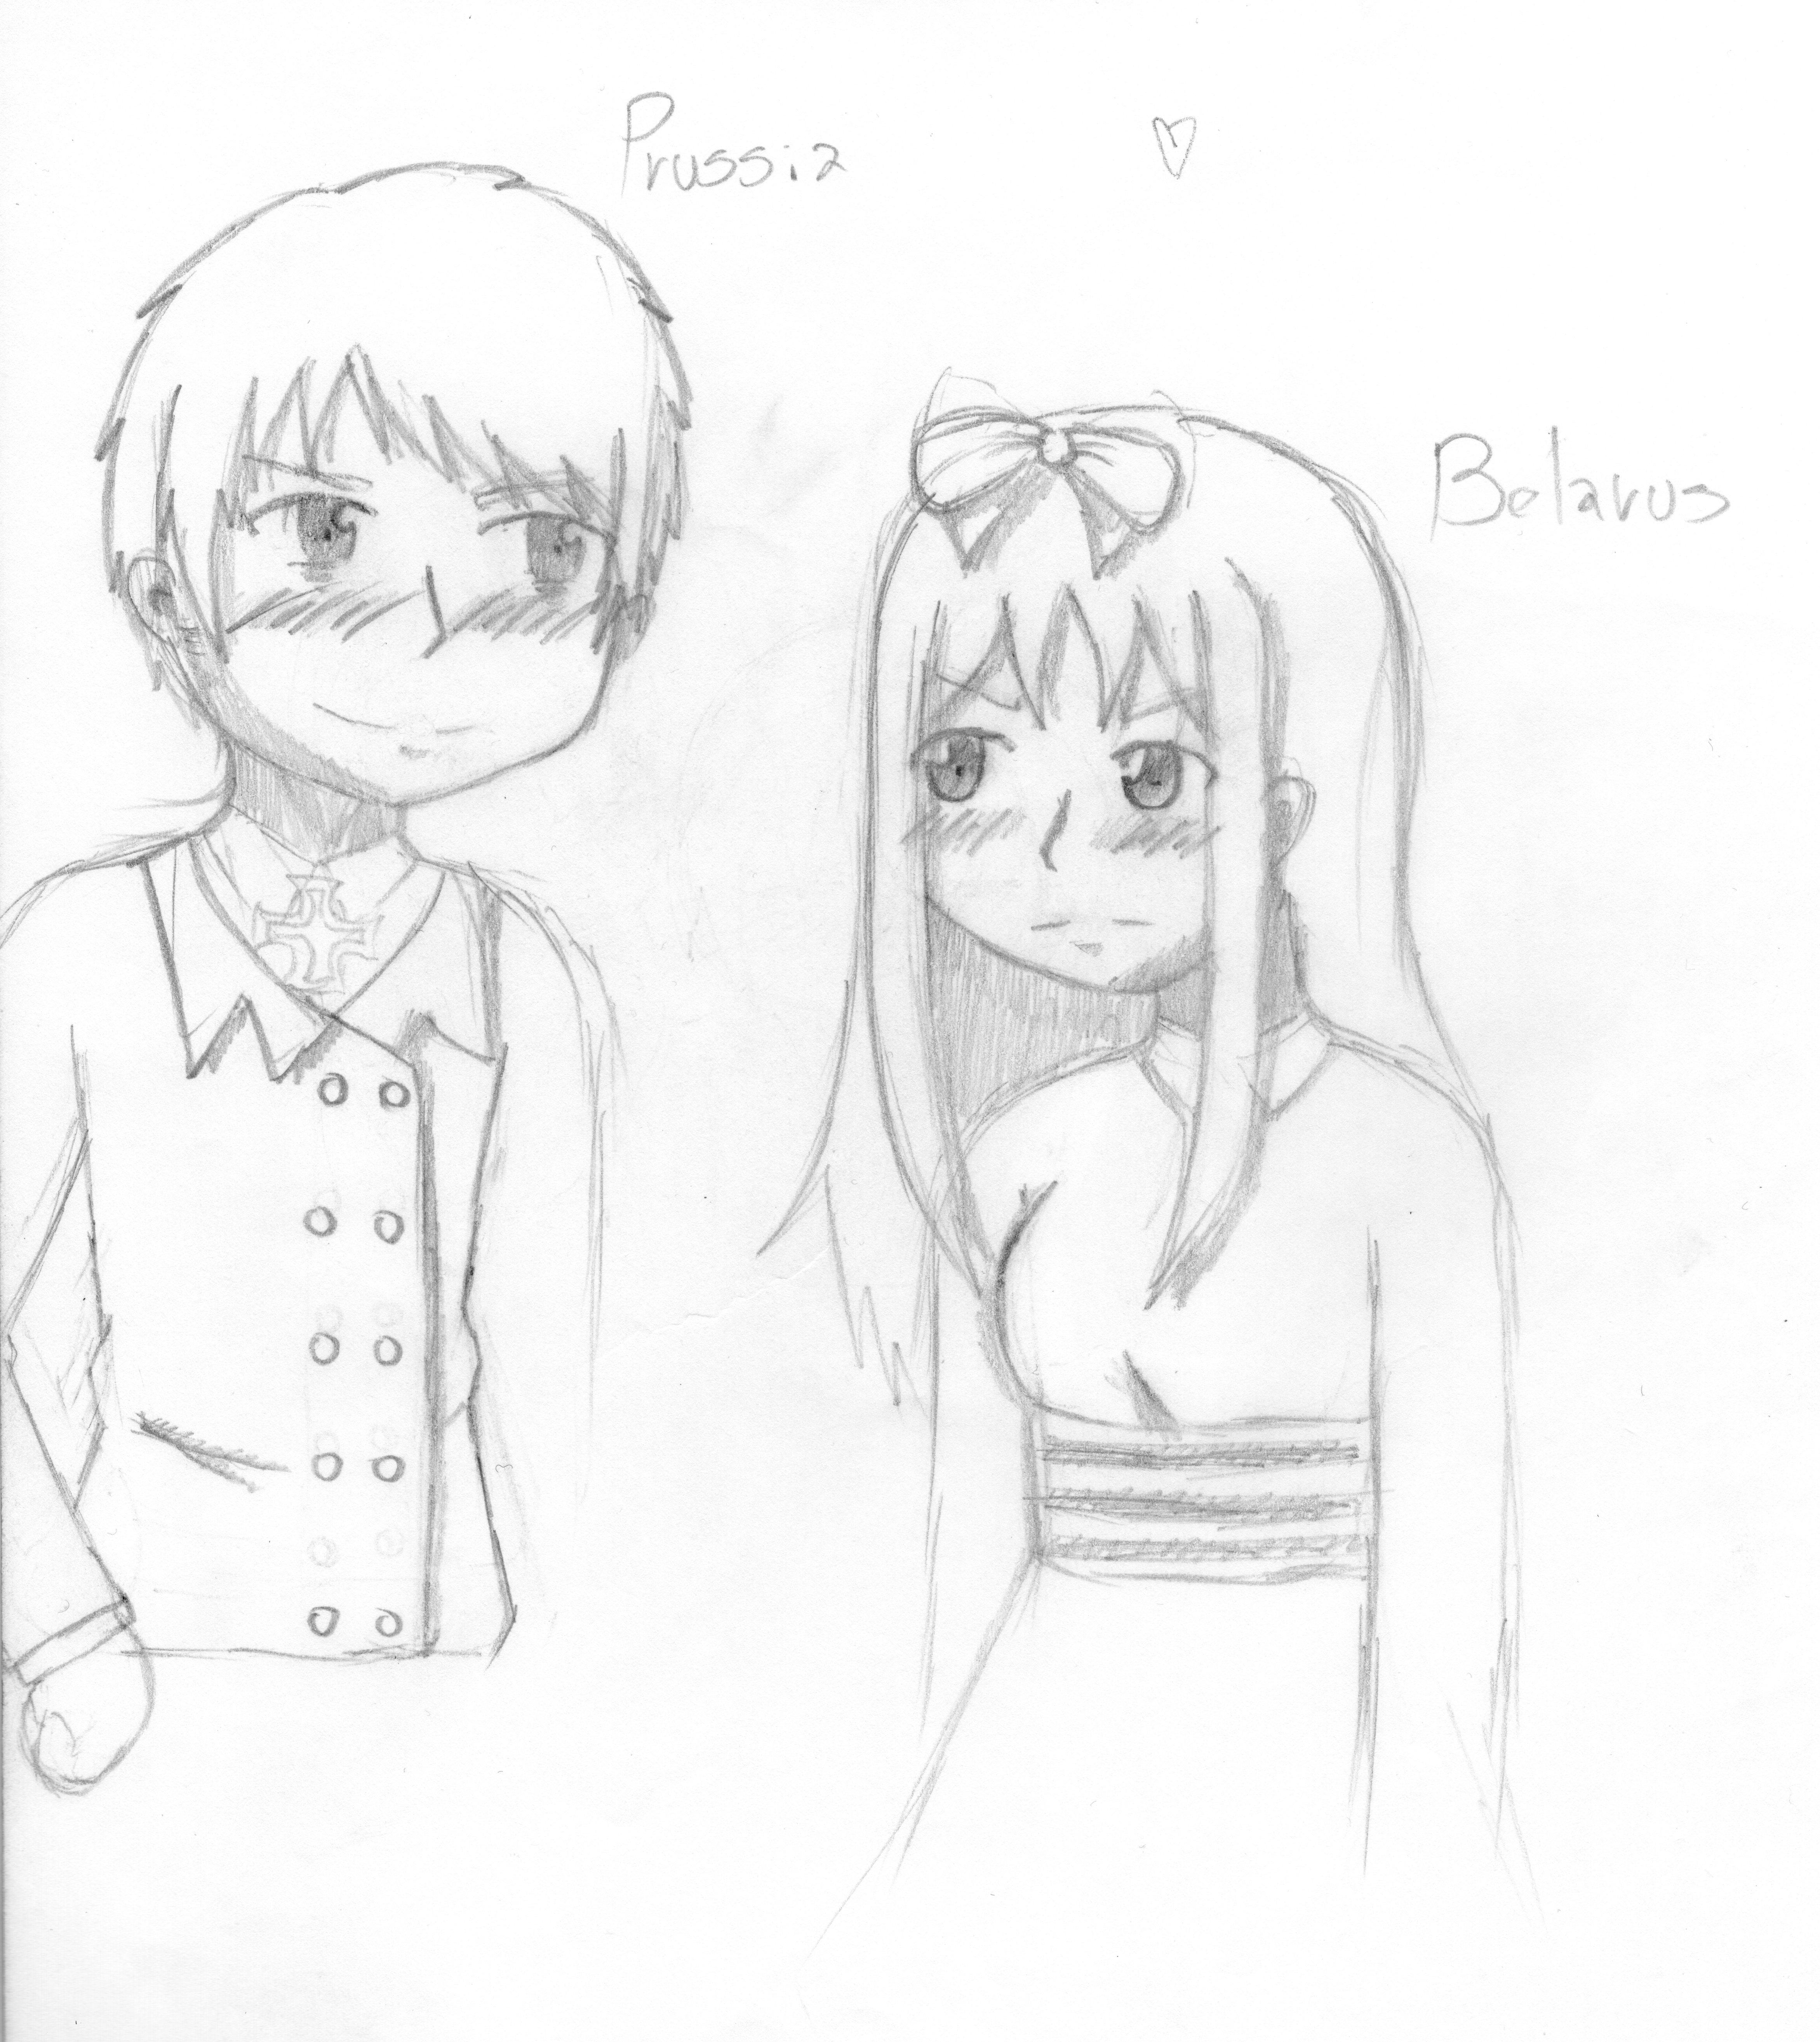 Prubela Sketch by Tirachi